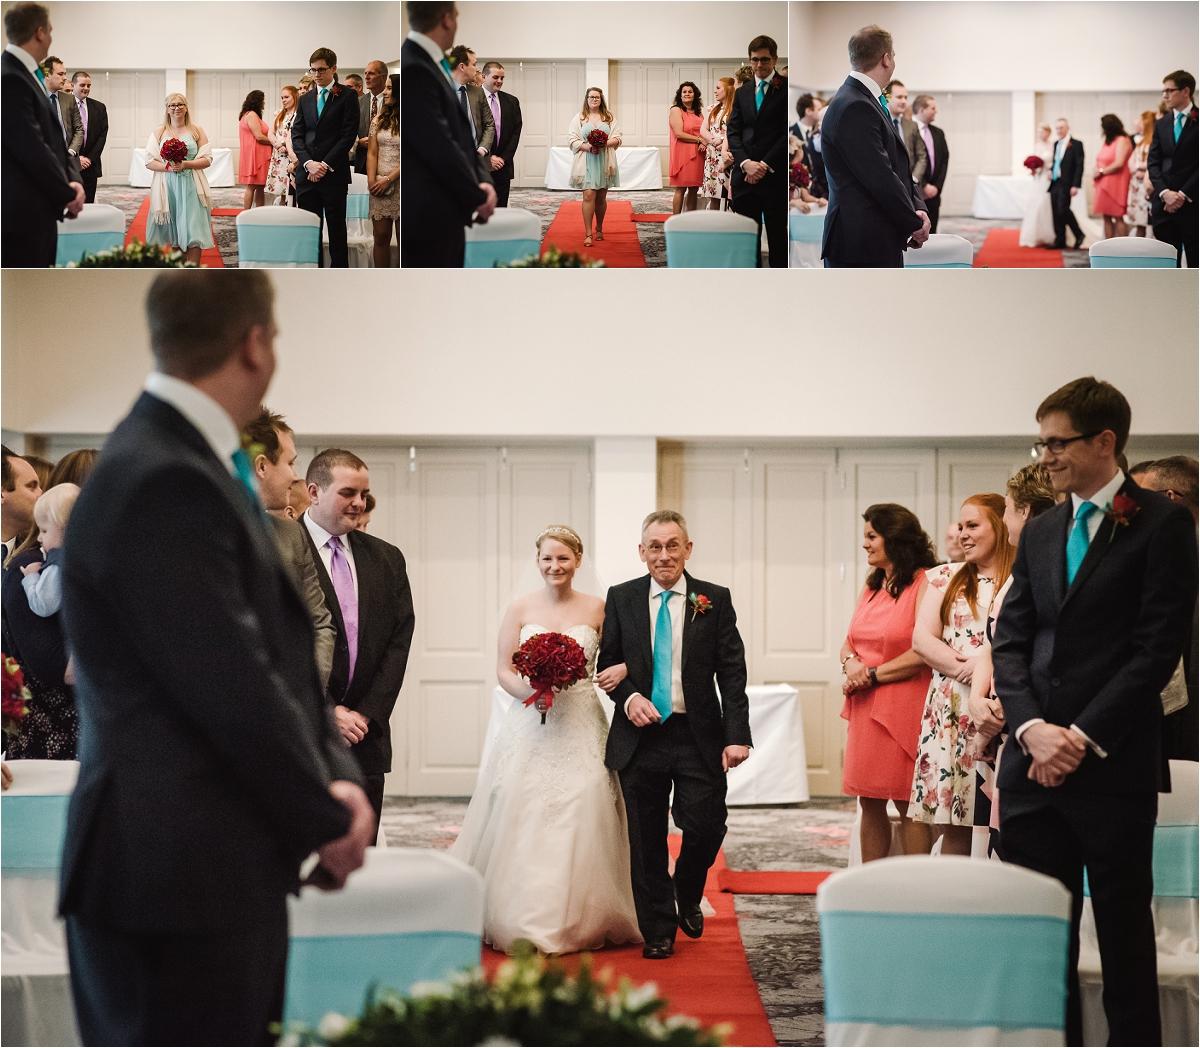 dan_emma_wedding_0011.jpg